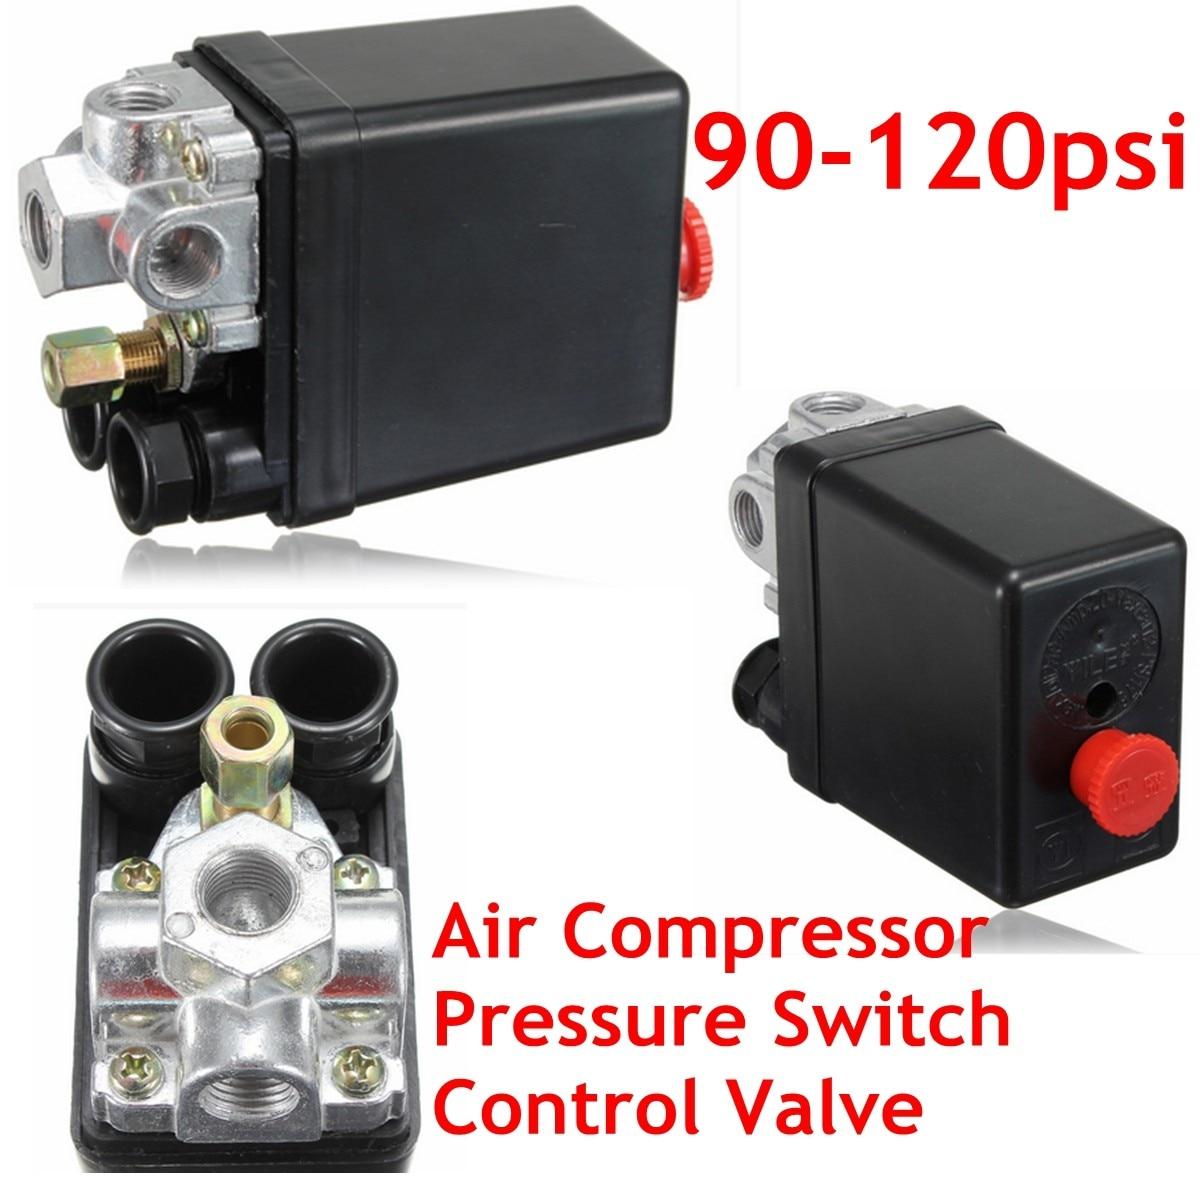 90-120PSI Heavy   Air Compressor Pressure Control Switch Valve 12 Bar 20A AC 220V 4 Port90-120PSI Heavy   Air Compressor Pressure Control Switch Valve 12 Bar 20A AC 220V 4 Port